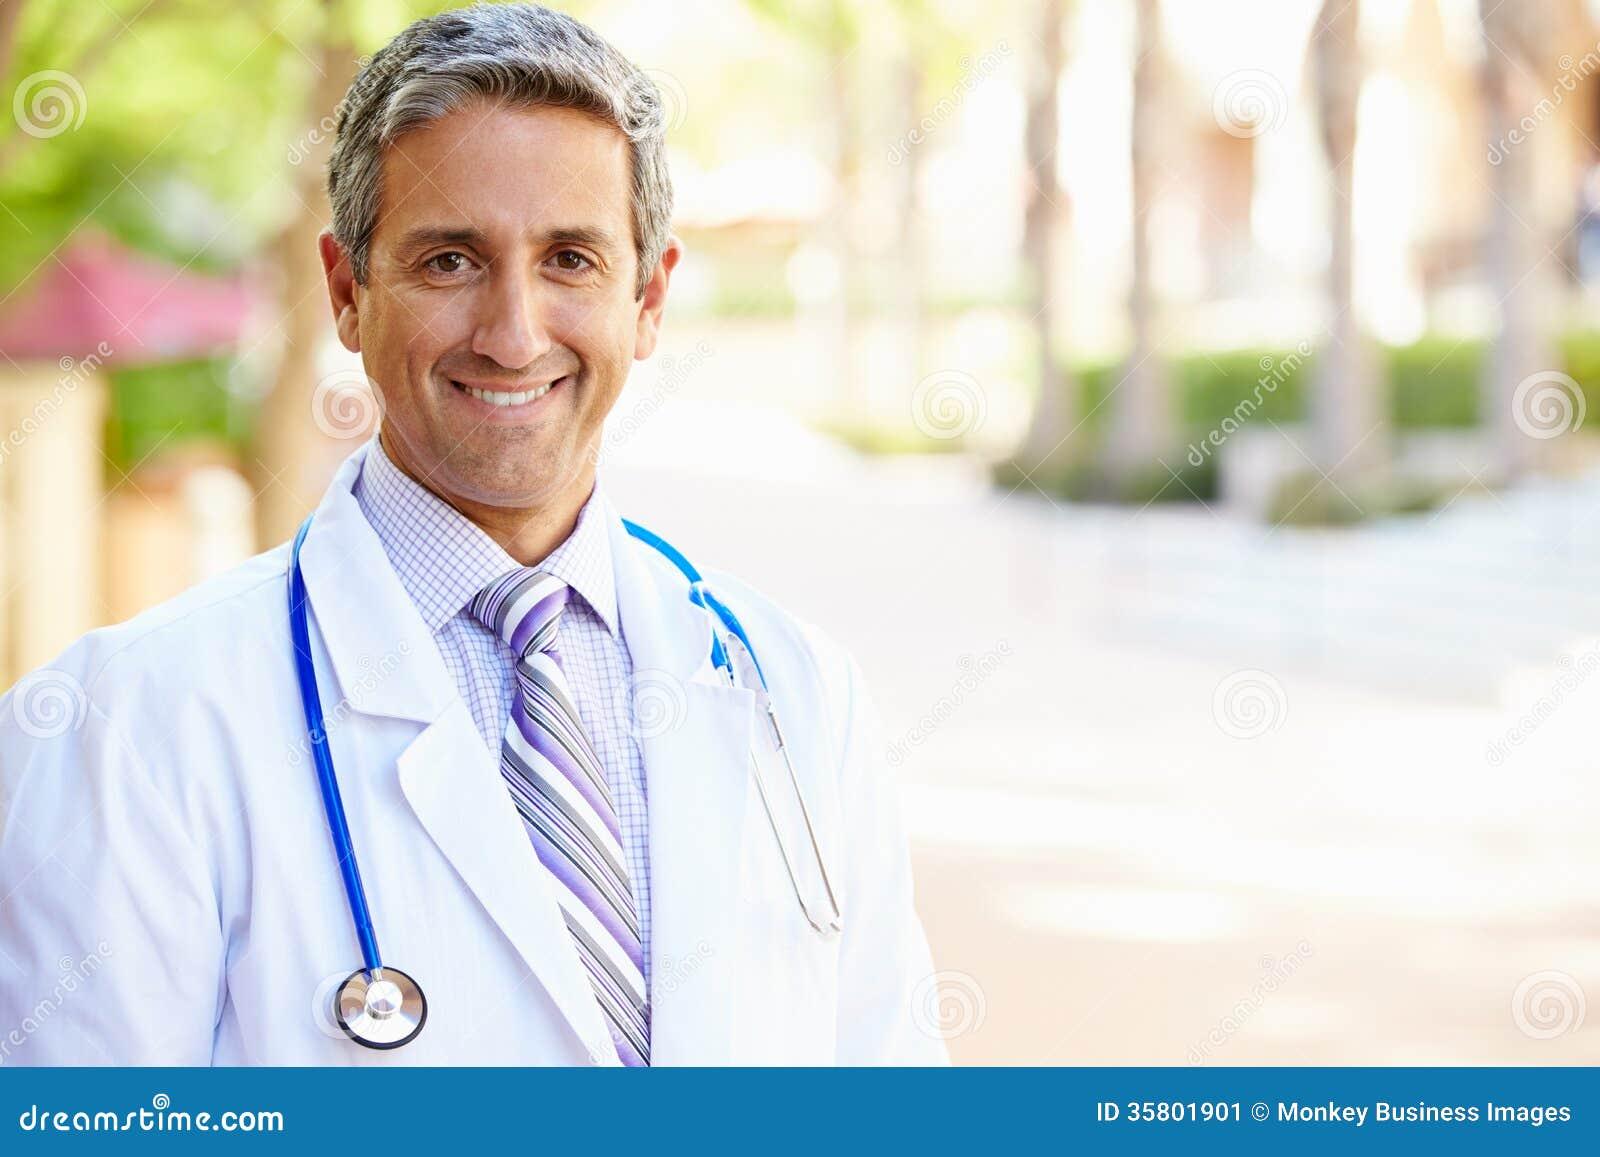 Outdoor Portrait Of Male Doctor